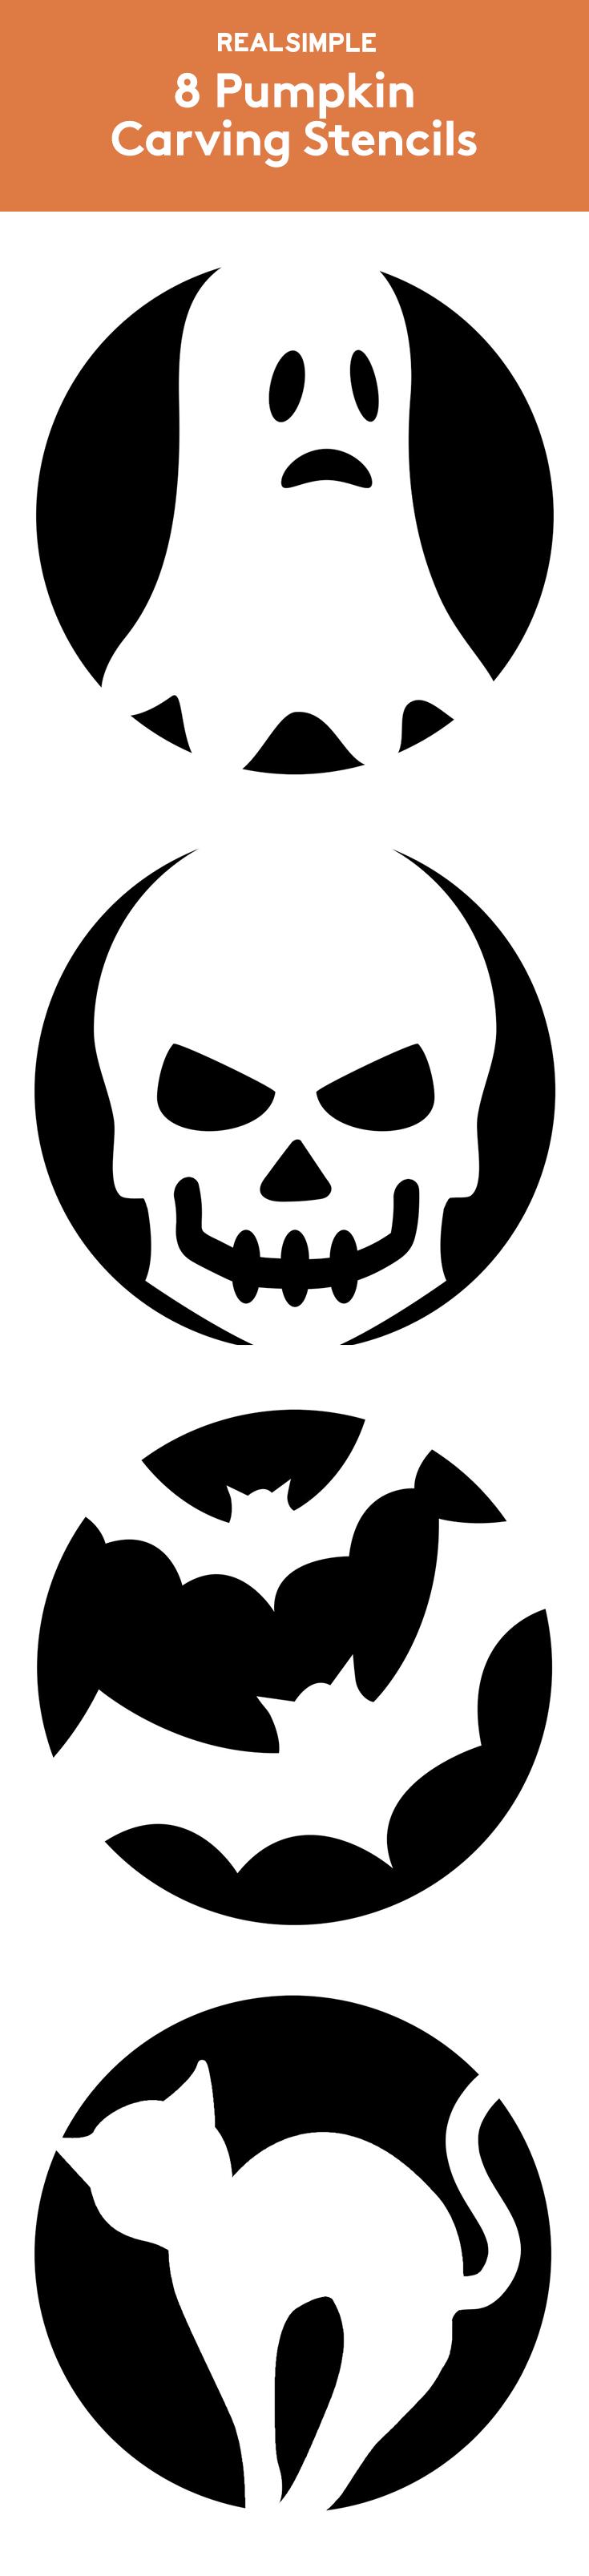 The Easiest Way to Create Amazing Jack-o-Lanterns   Pinterest ...